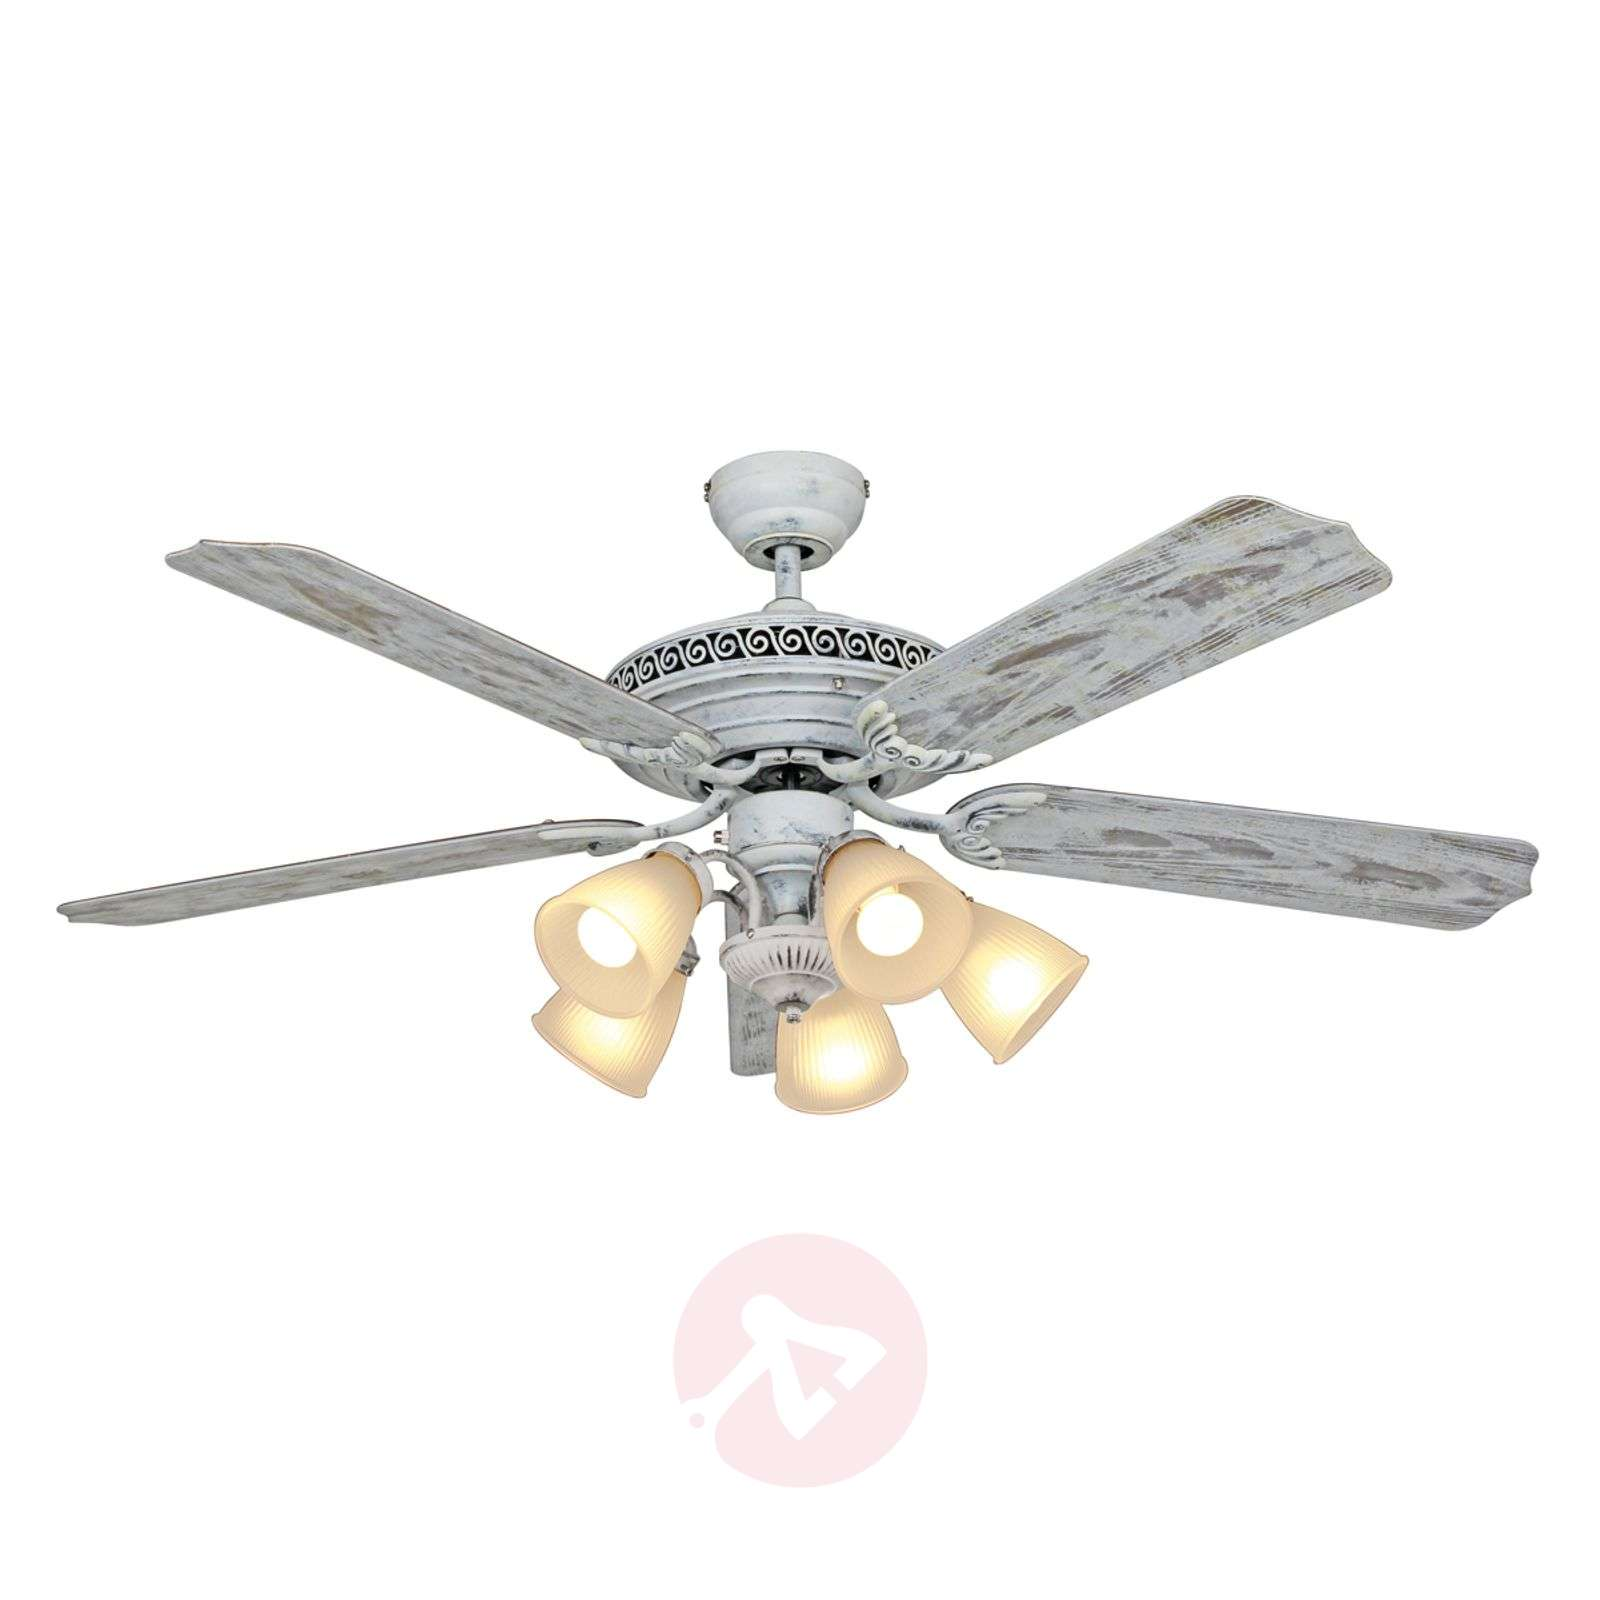 Quiet ceiling fan Centurion with a light-2015118-01